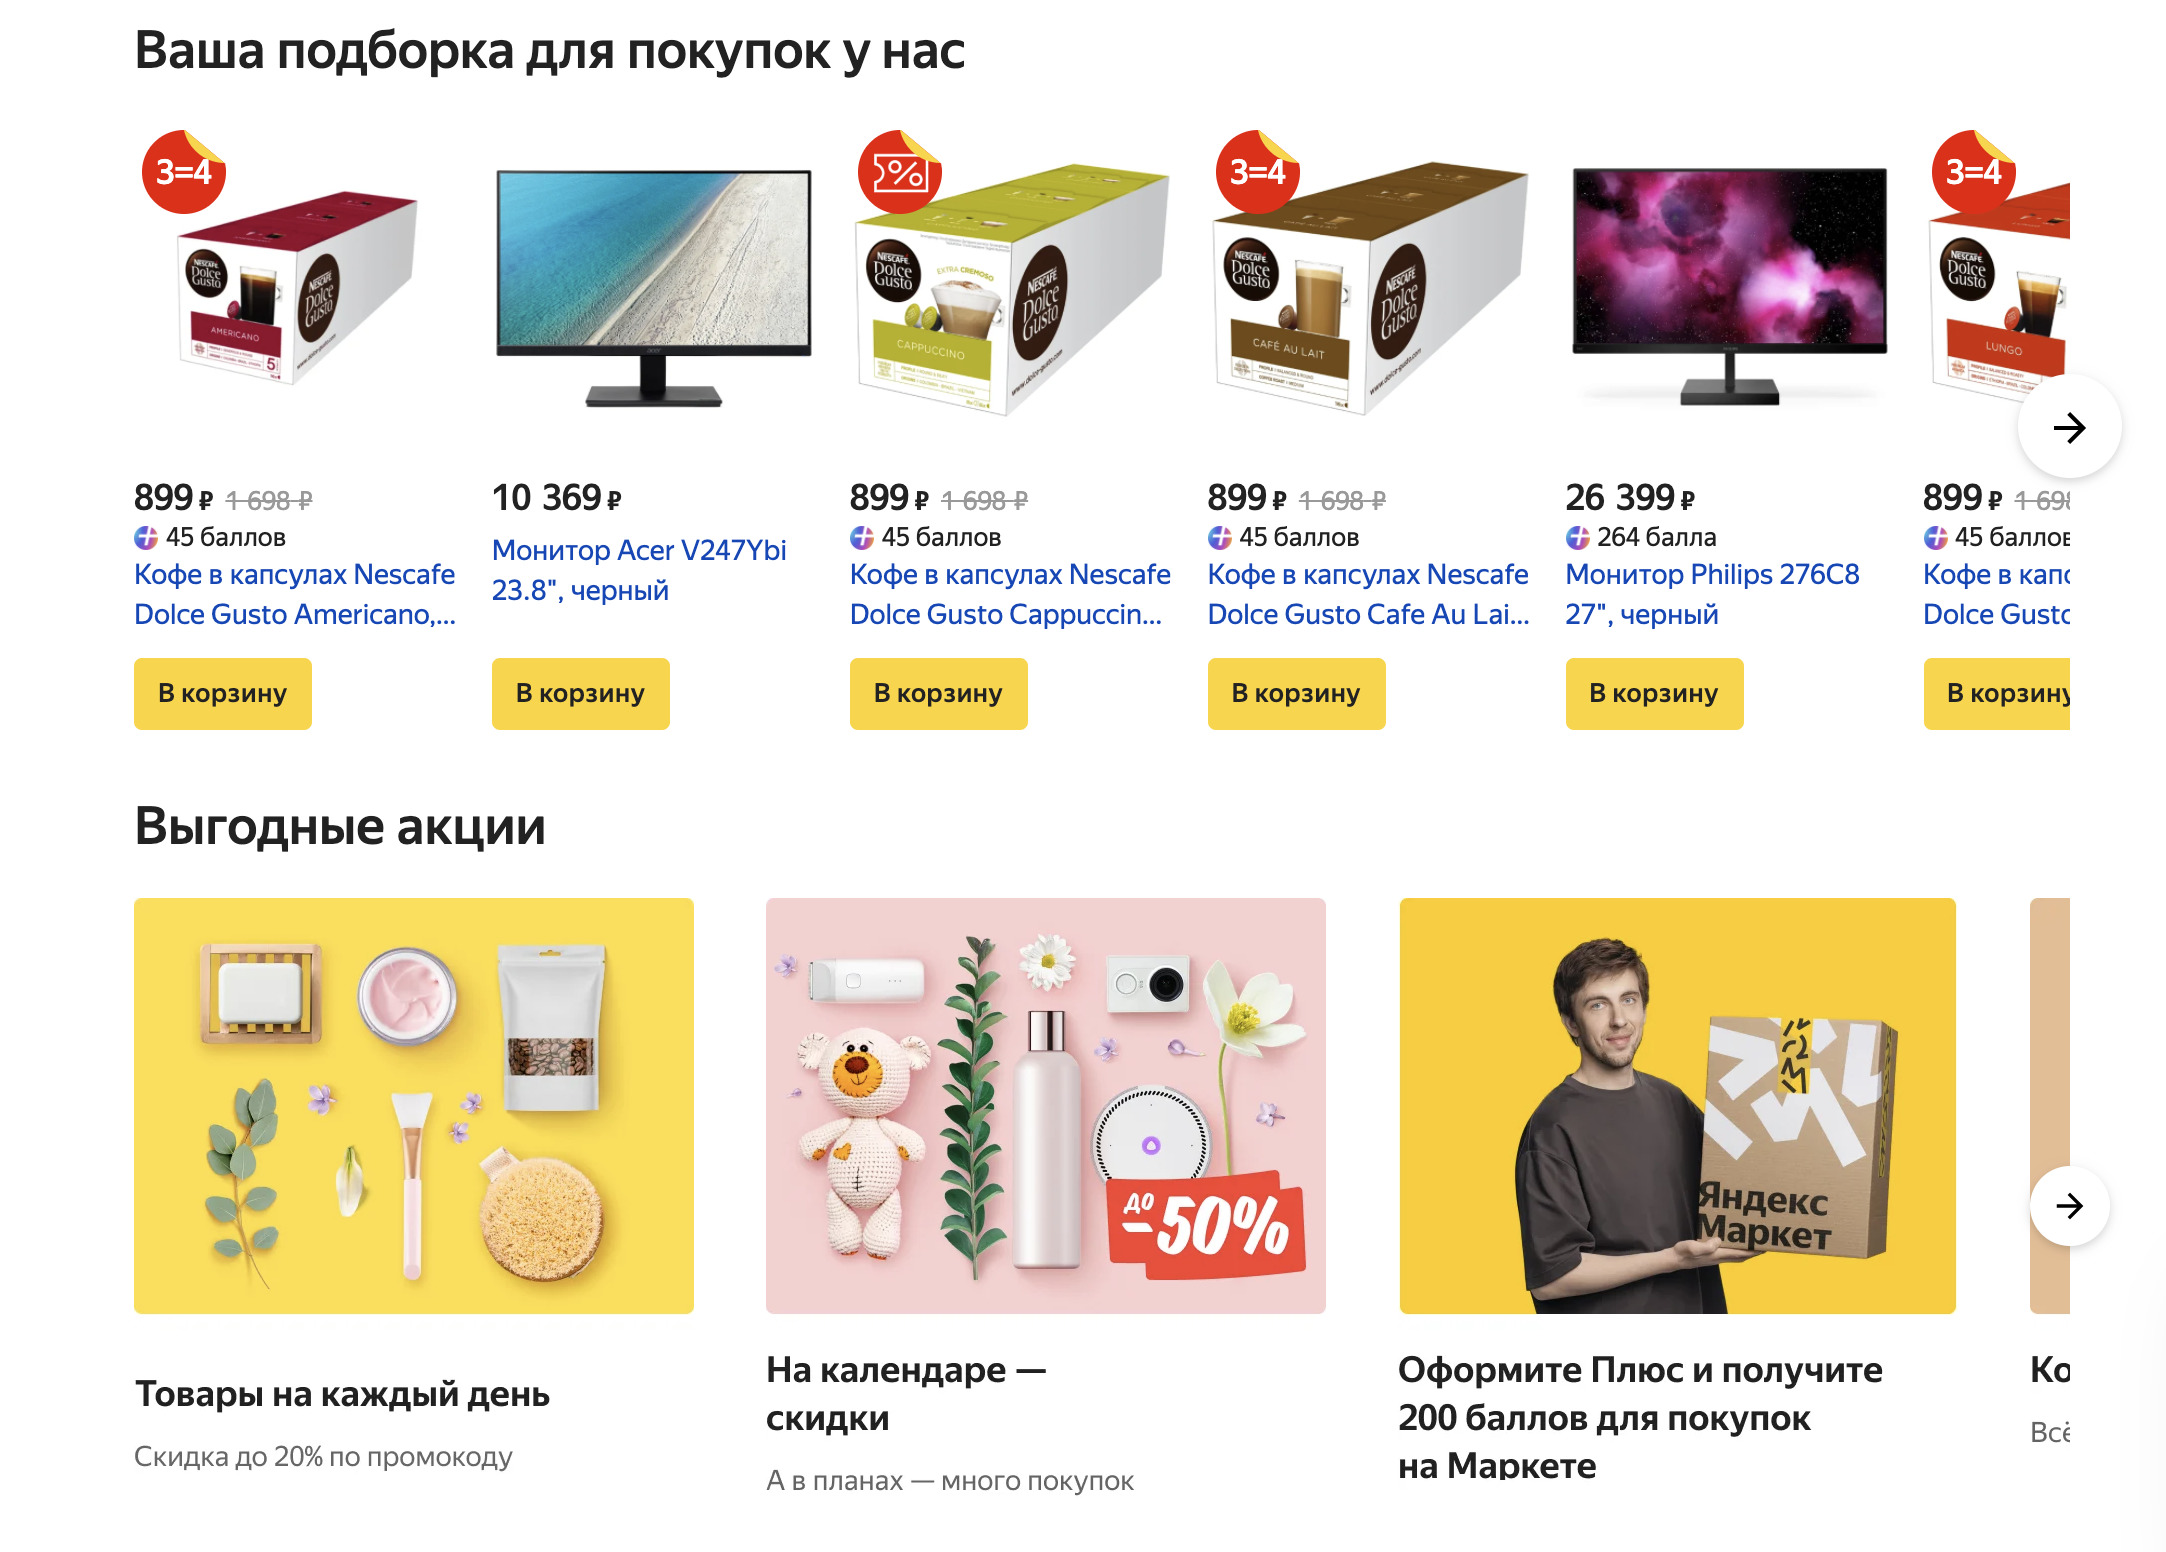 Доставка из Яндекс.Маркет в Фрязино, сроки, пункты выдачи, каталог